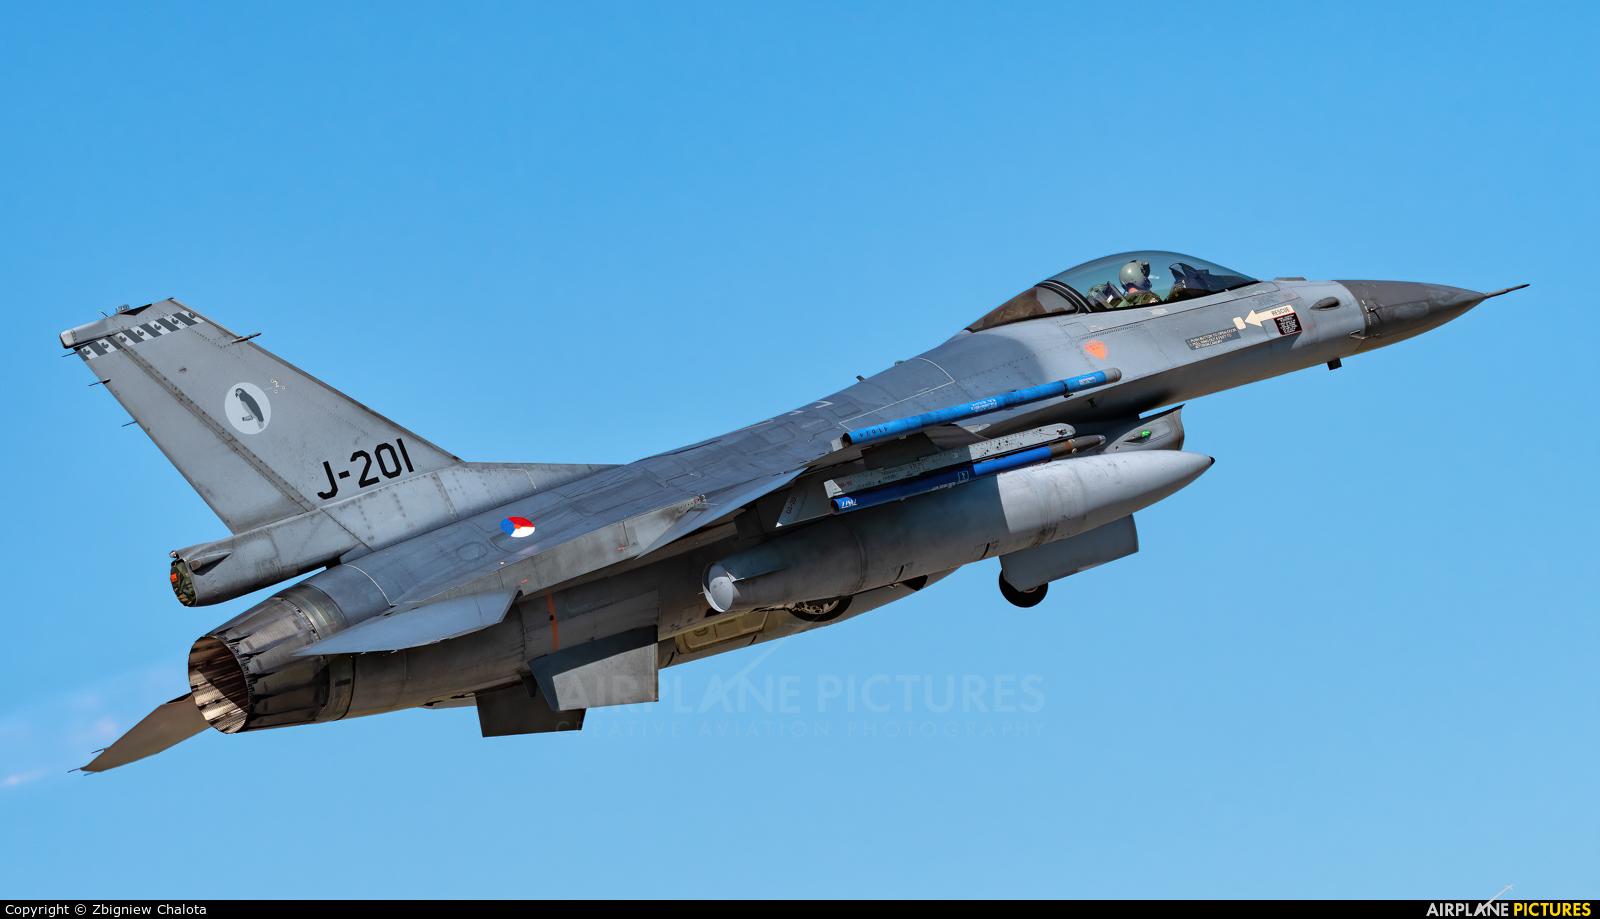 Netherlands - Air Force J-201 aircraft at Orange - Caritat